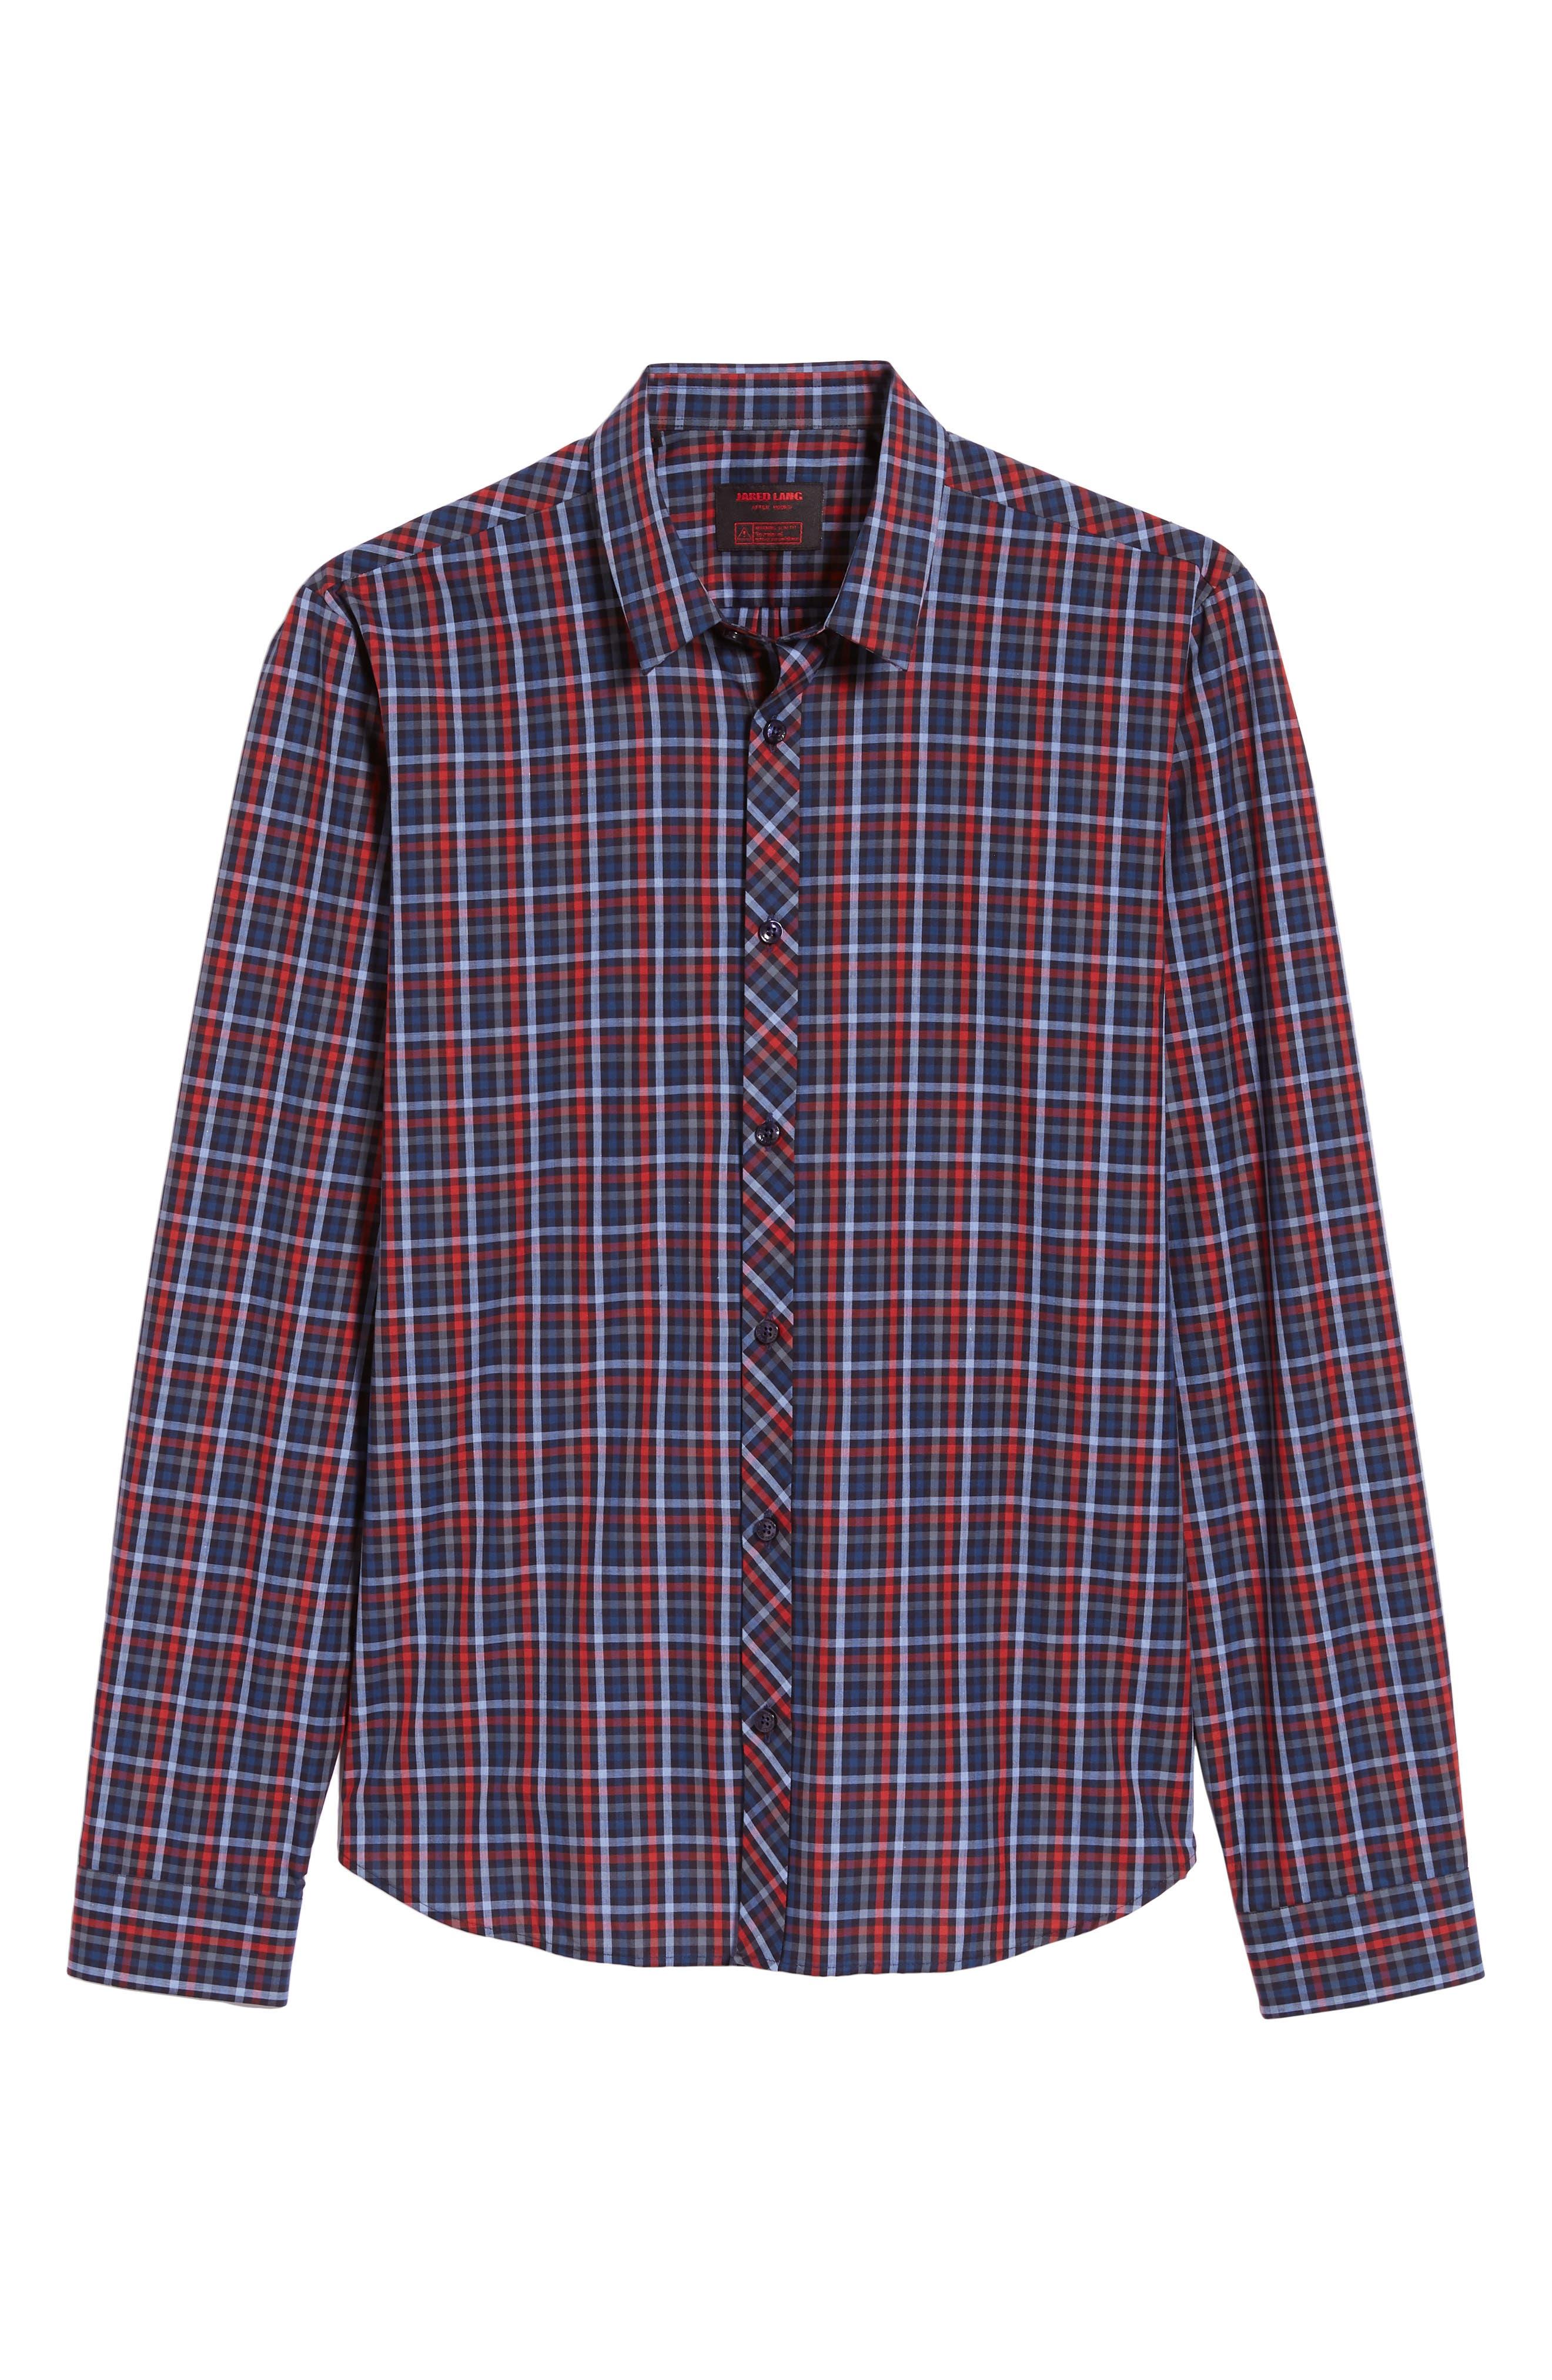 Trim Fit Sport Shirt,                             Alternate thumbnail 5, color,                             RED - BLUE MULTI CHECK